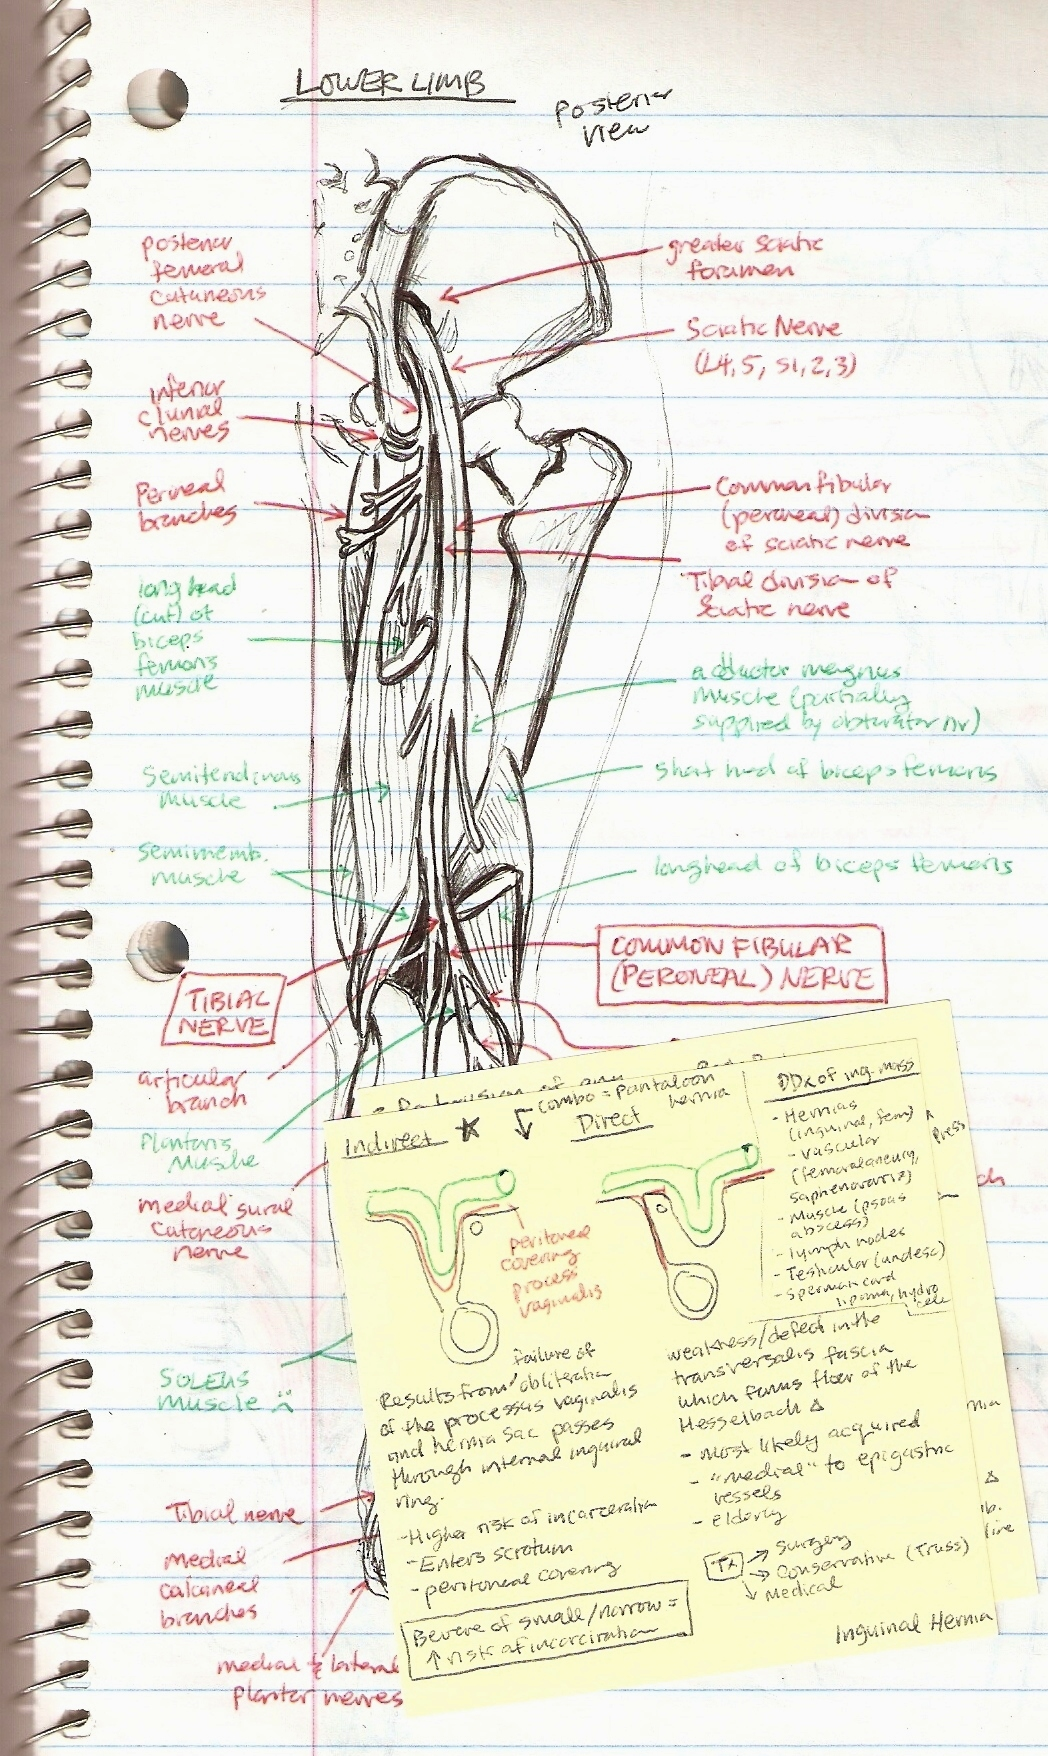 Michiko Maruyama Orthopedic Rotation Sketches Leg Nerves plus Inguinal Hernia Sticky Note Diagram